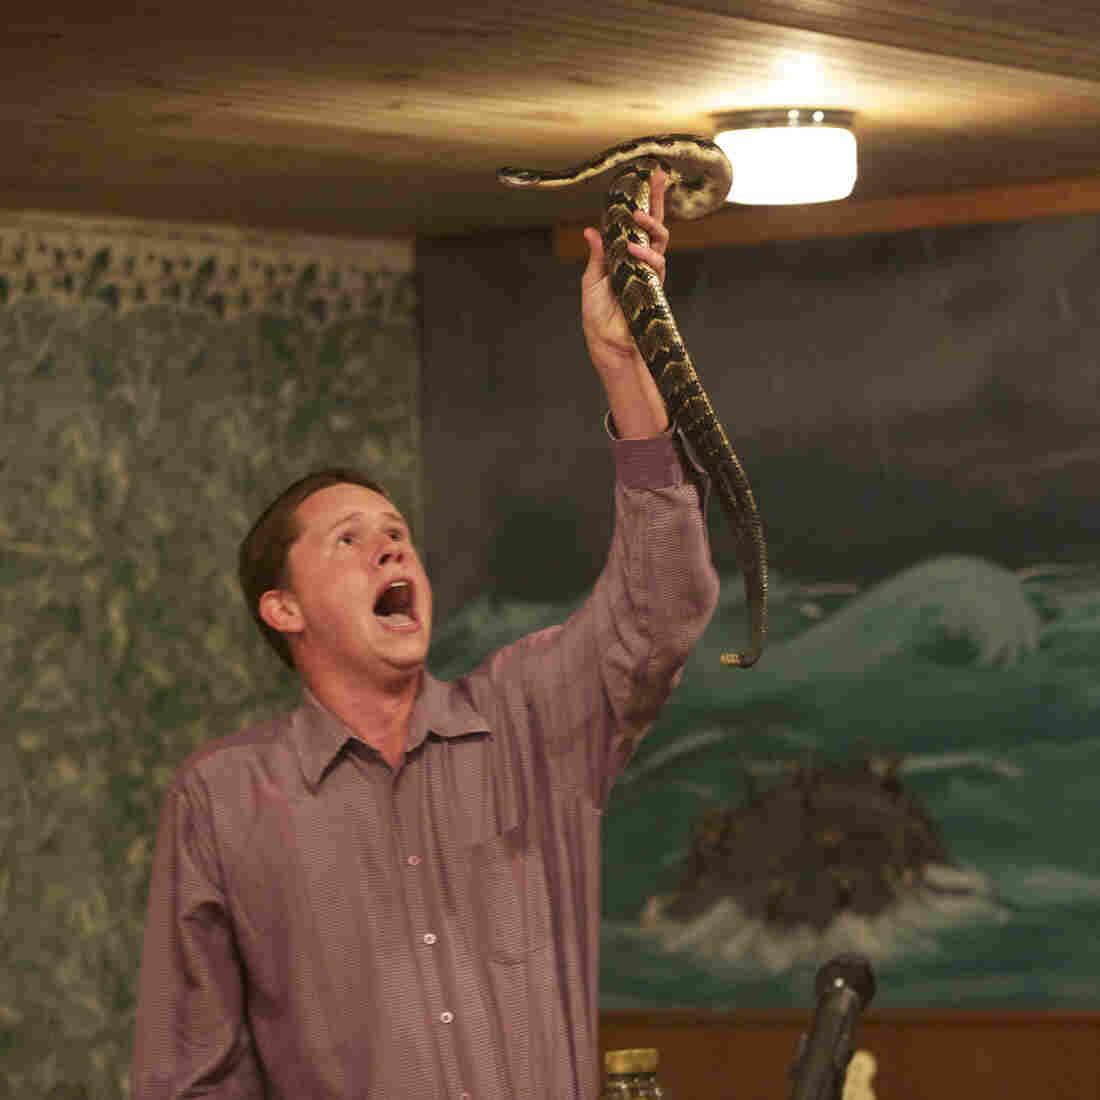 Andrew Hamblin preaches while holding a snake above his head, LaFollette, Tenn.